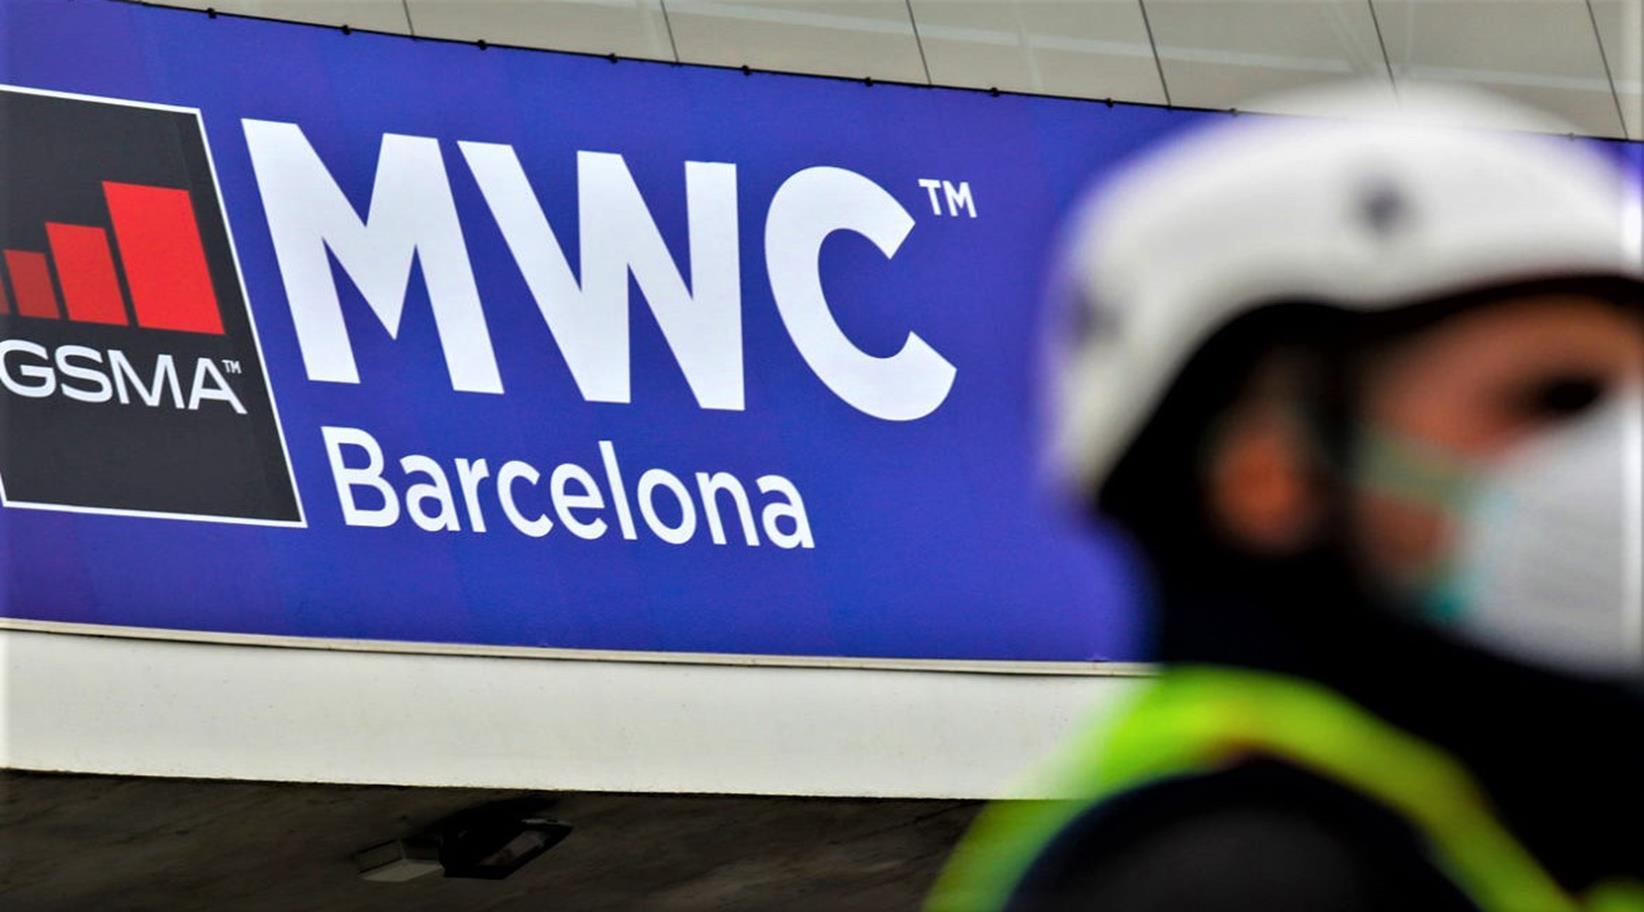 Ada Colau En Porno mobile world congress in barcelona called off over